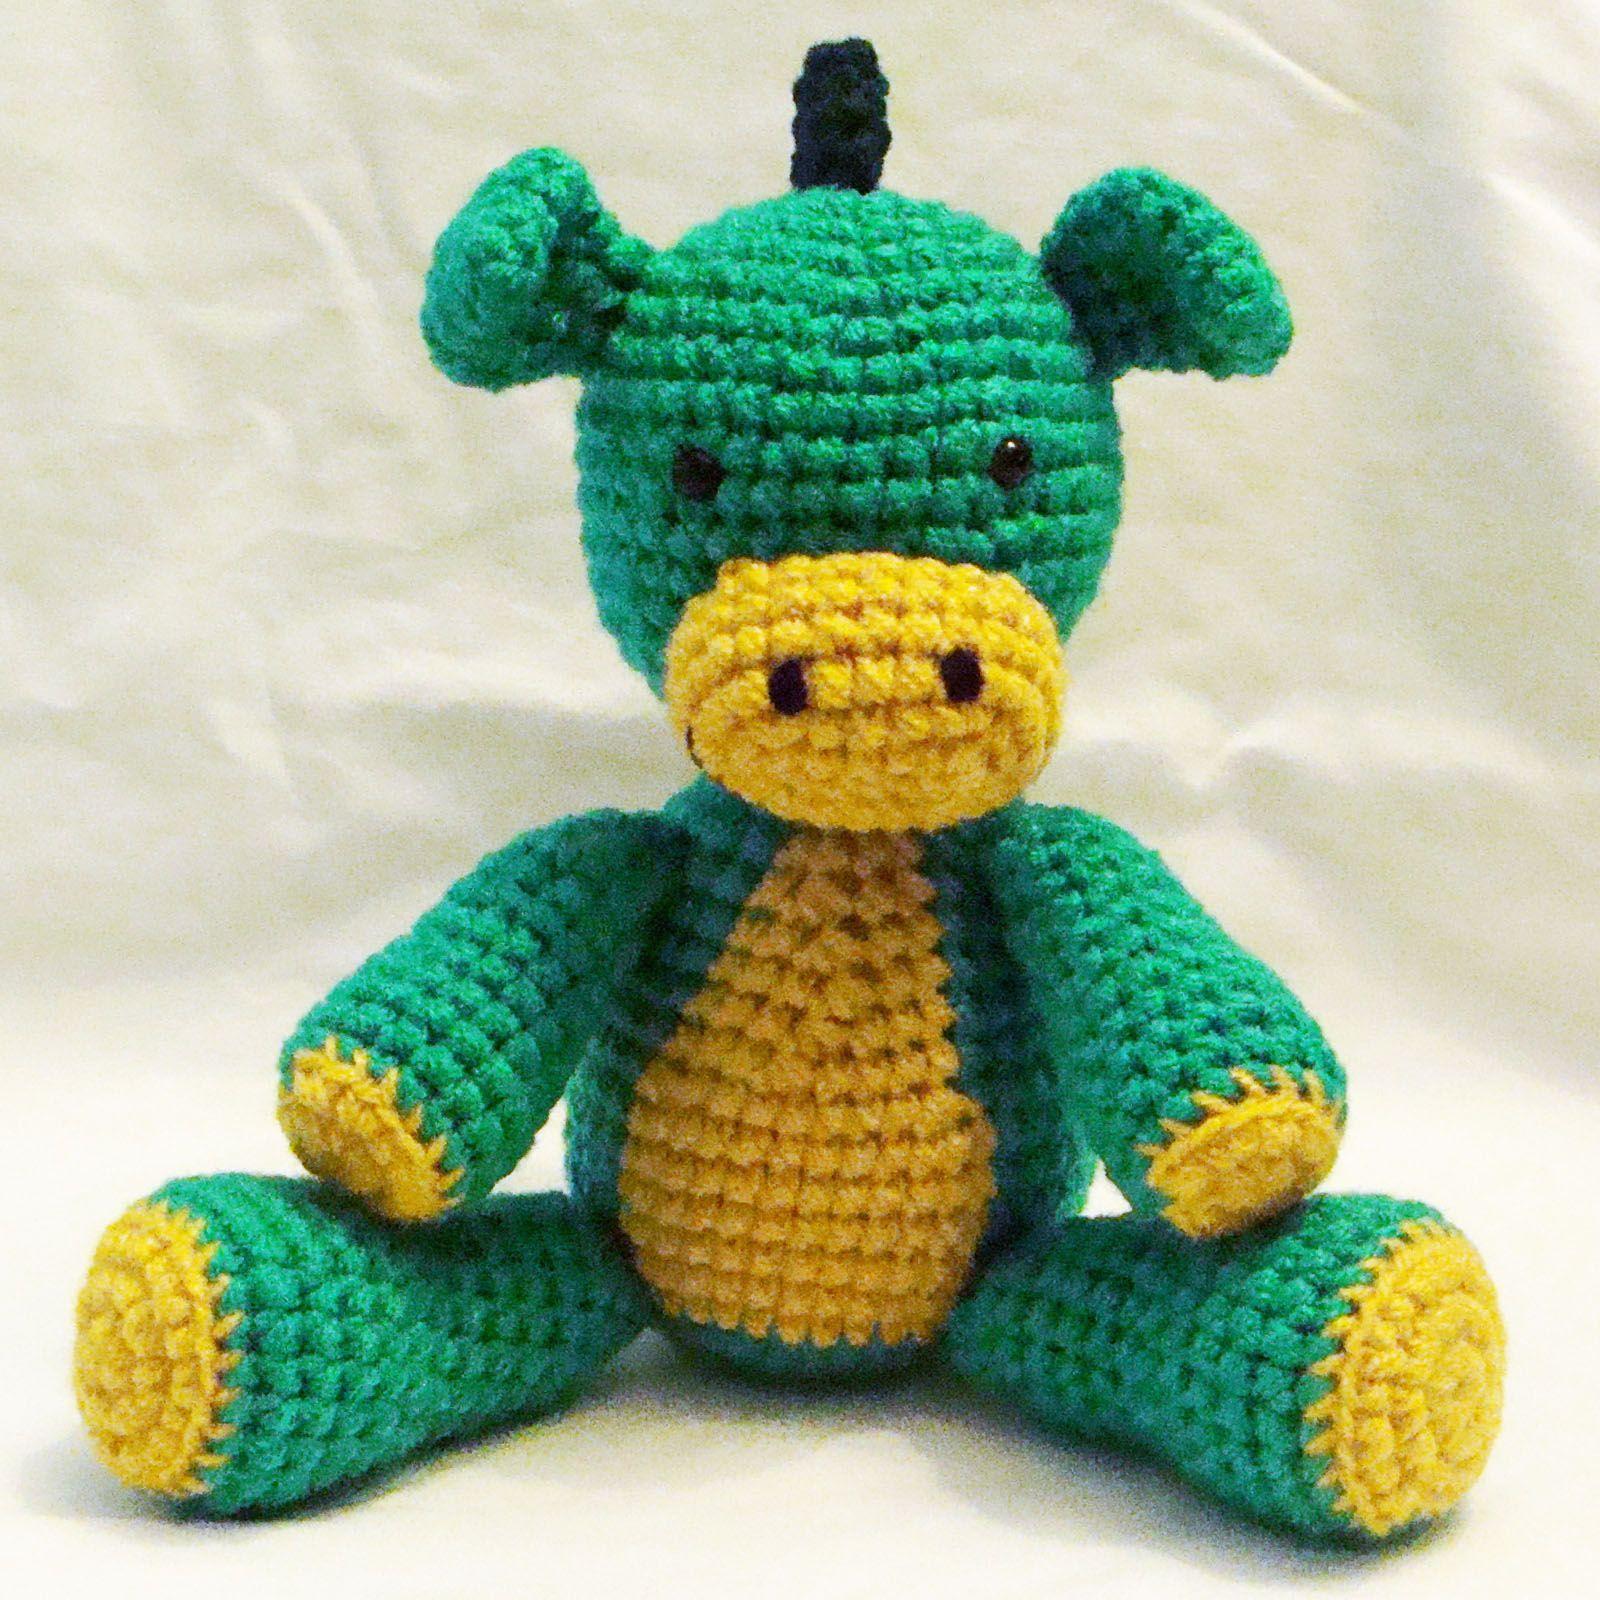 Dragón tejido al crochet